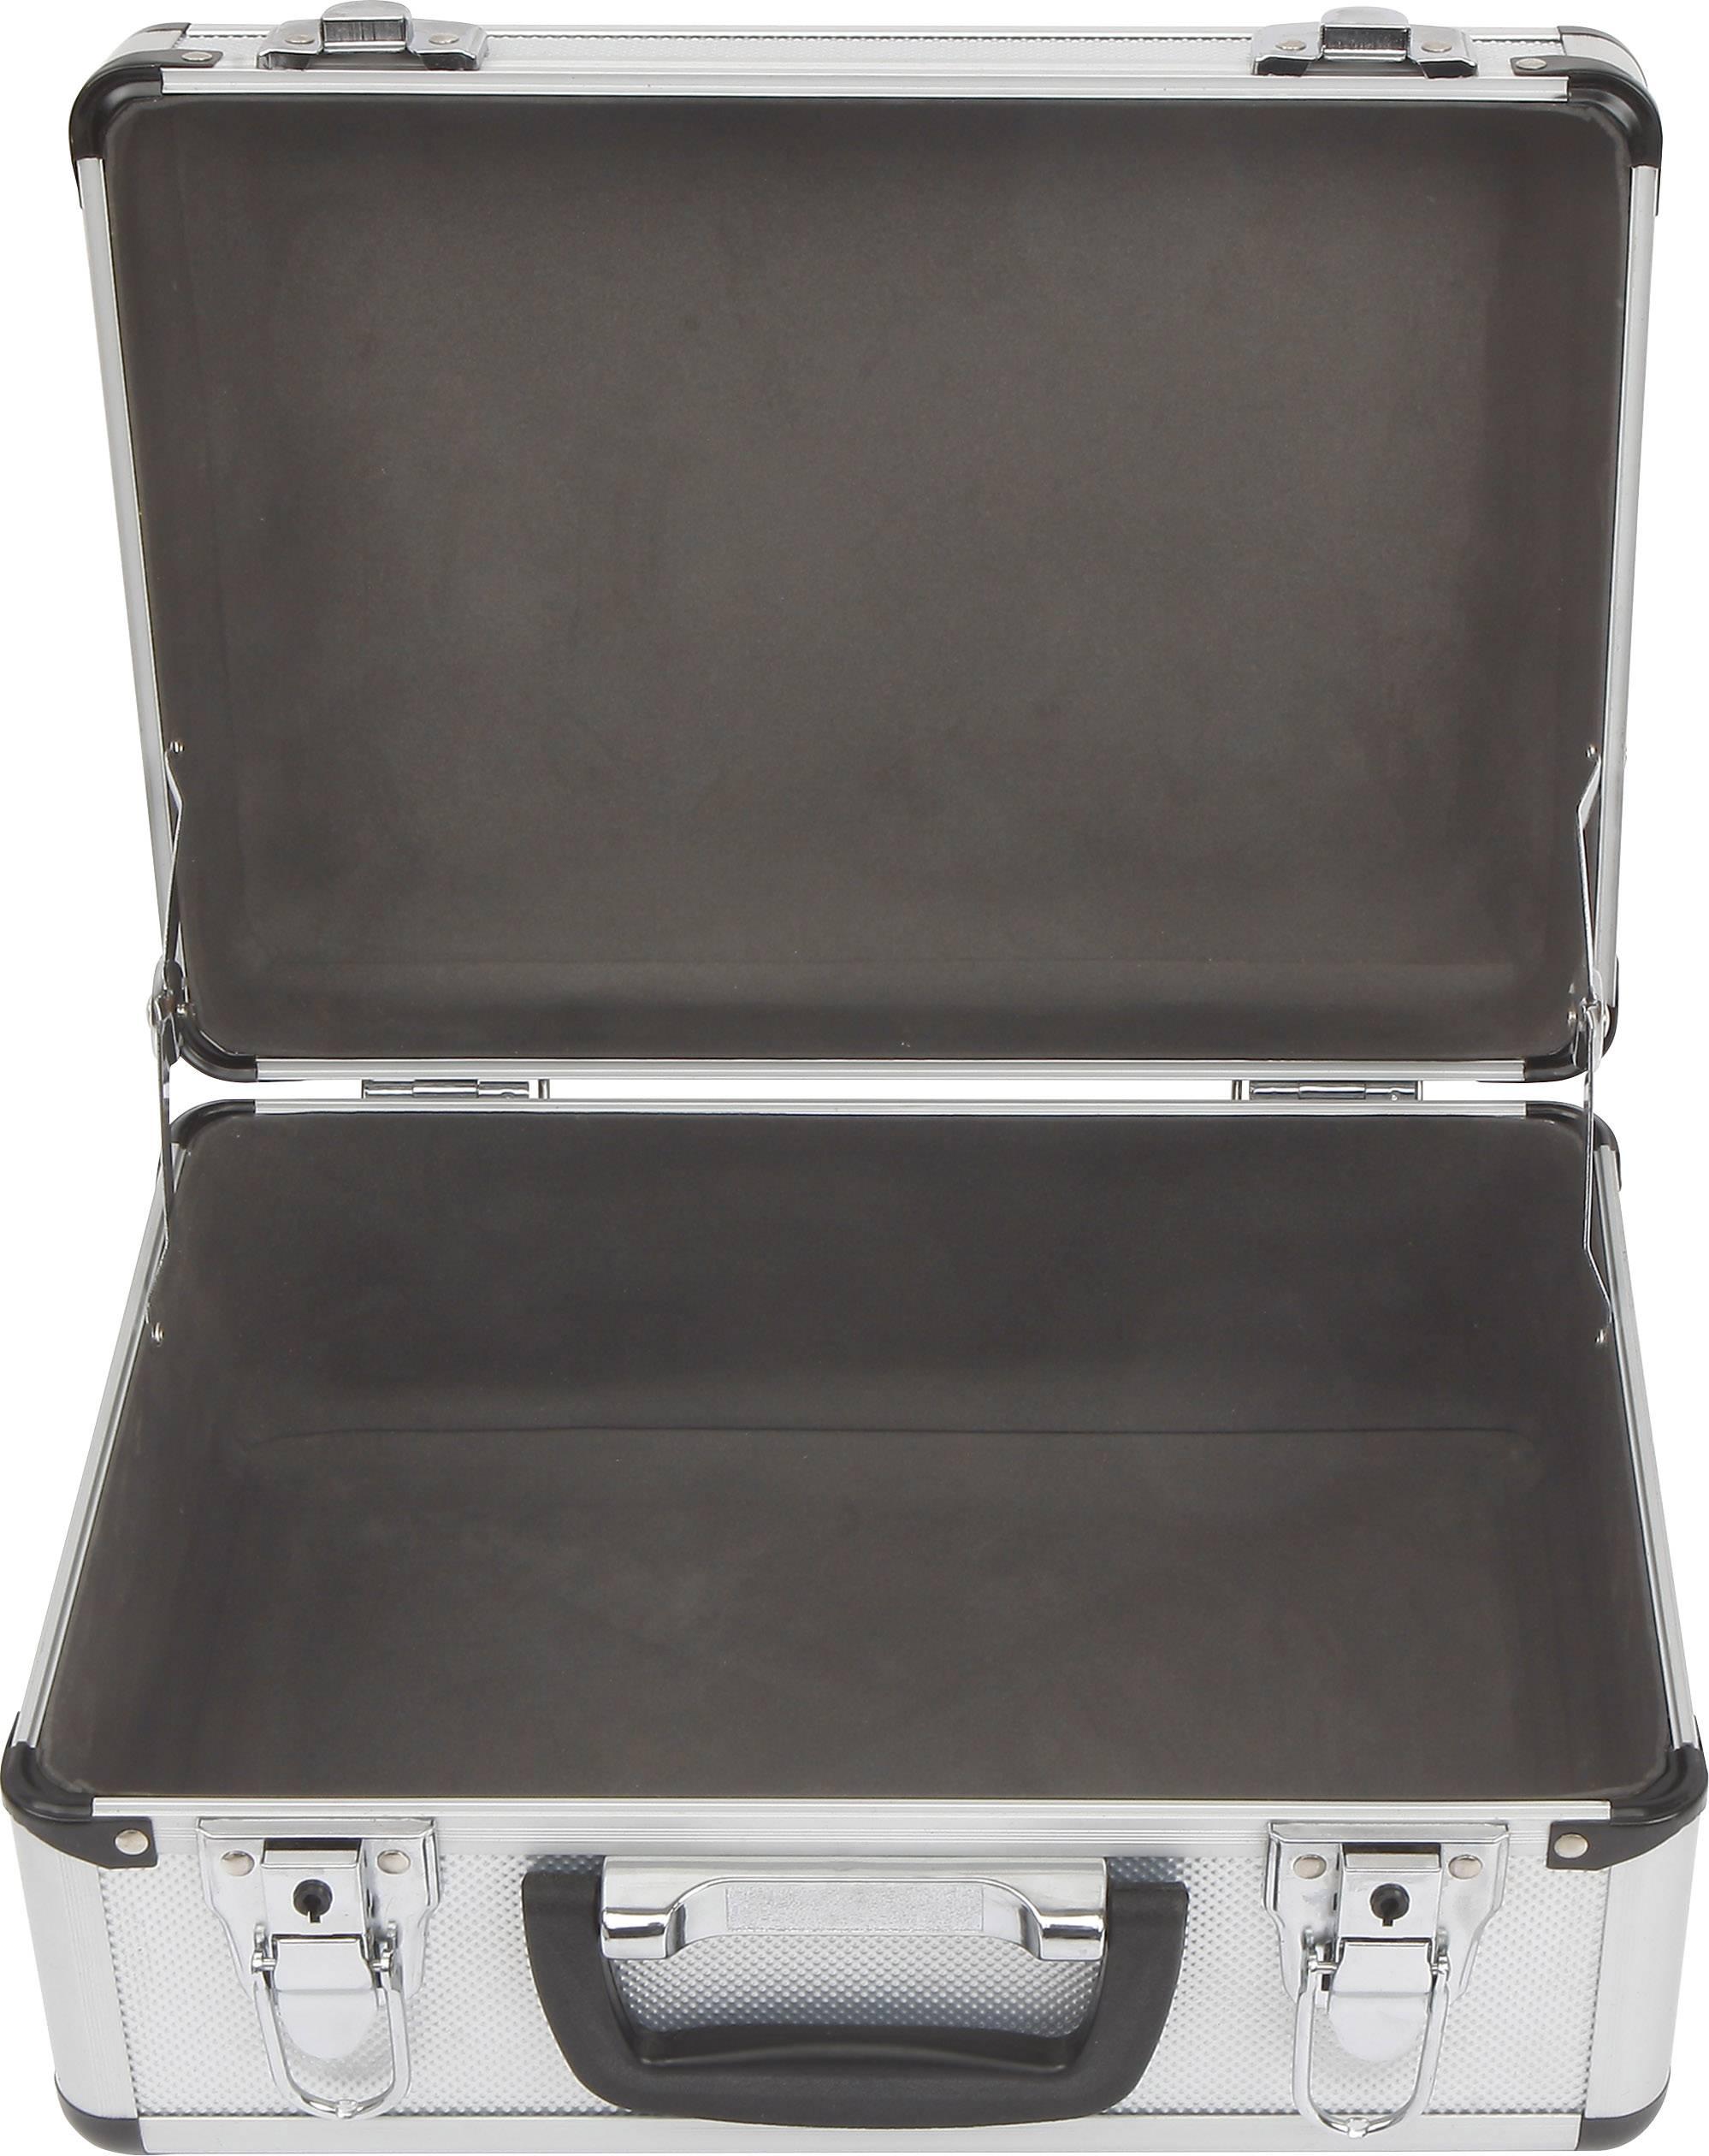 Kufrík na náradie TOOLCRAFT 1409407, (š x v x h) 320 x 150 x 230 mm